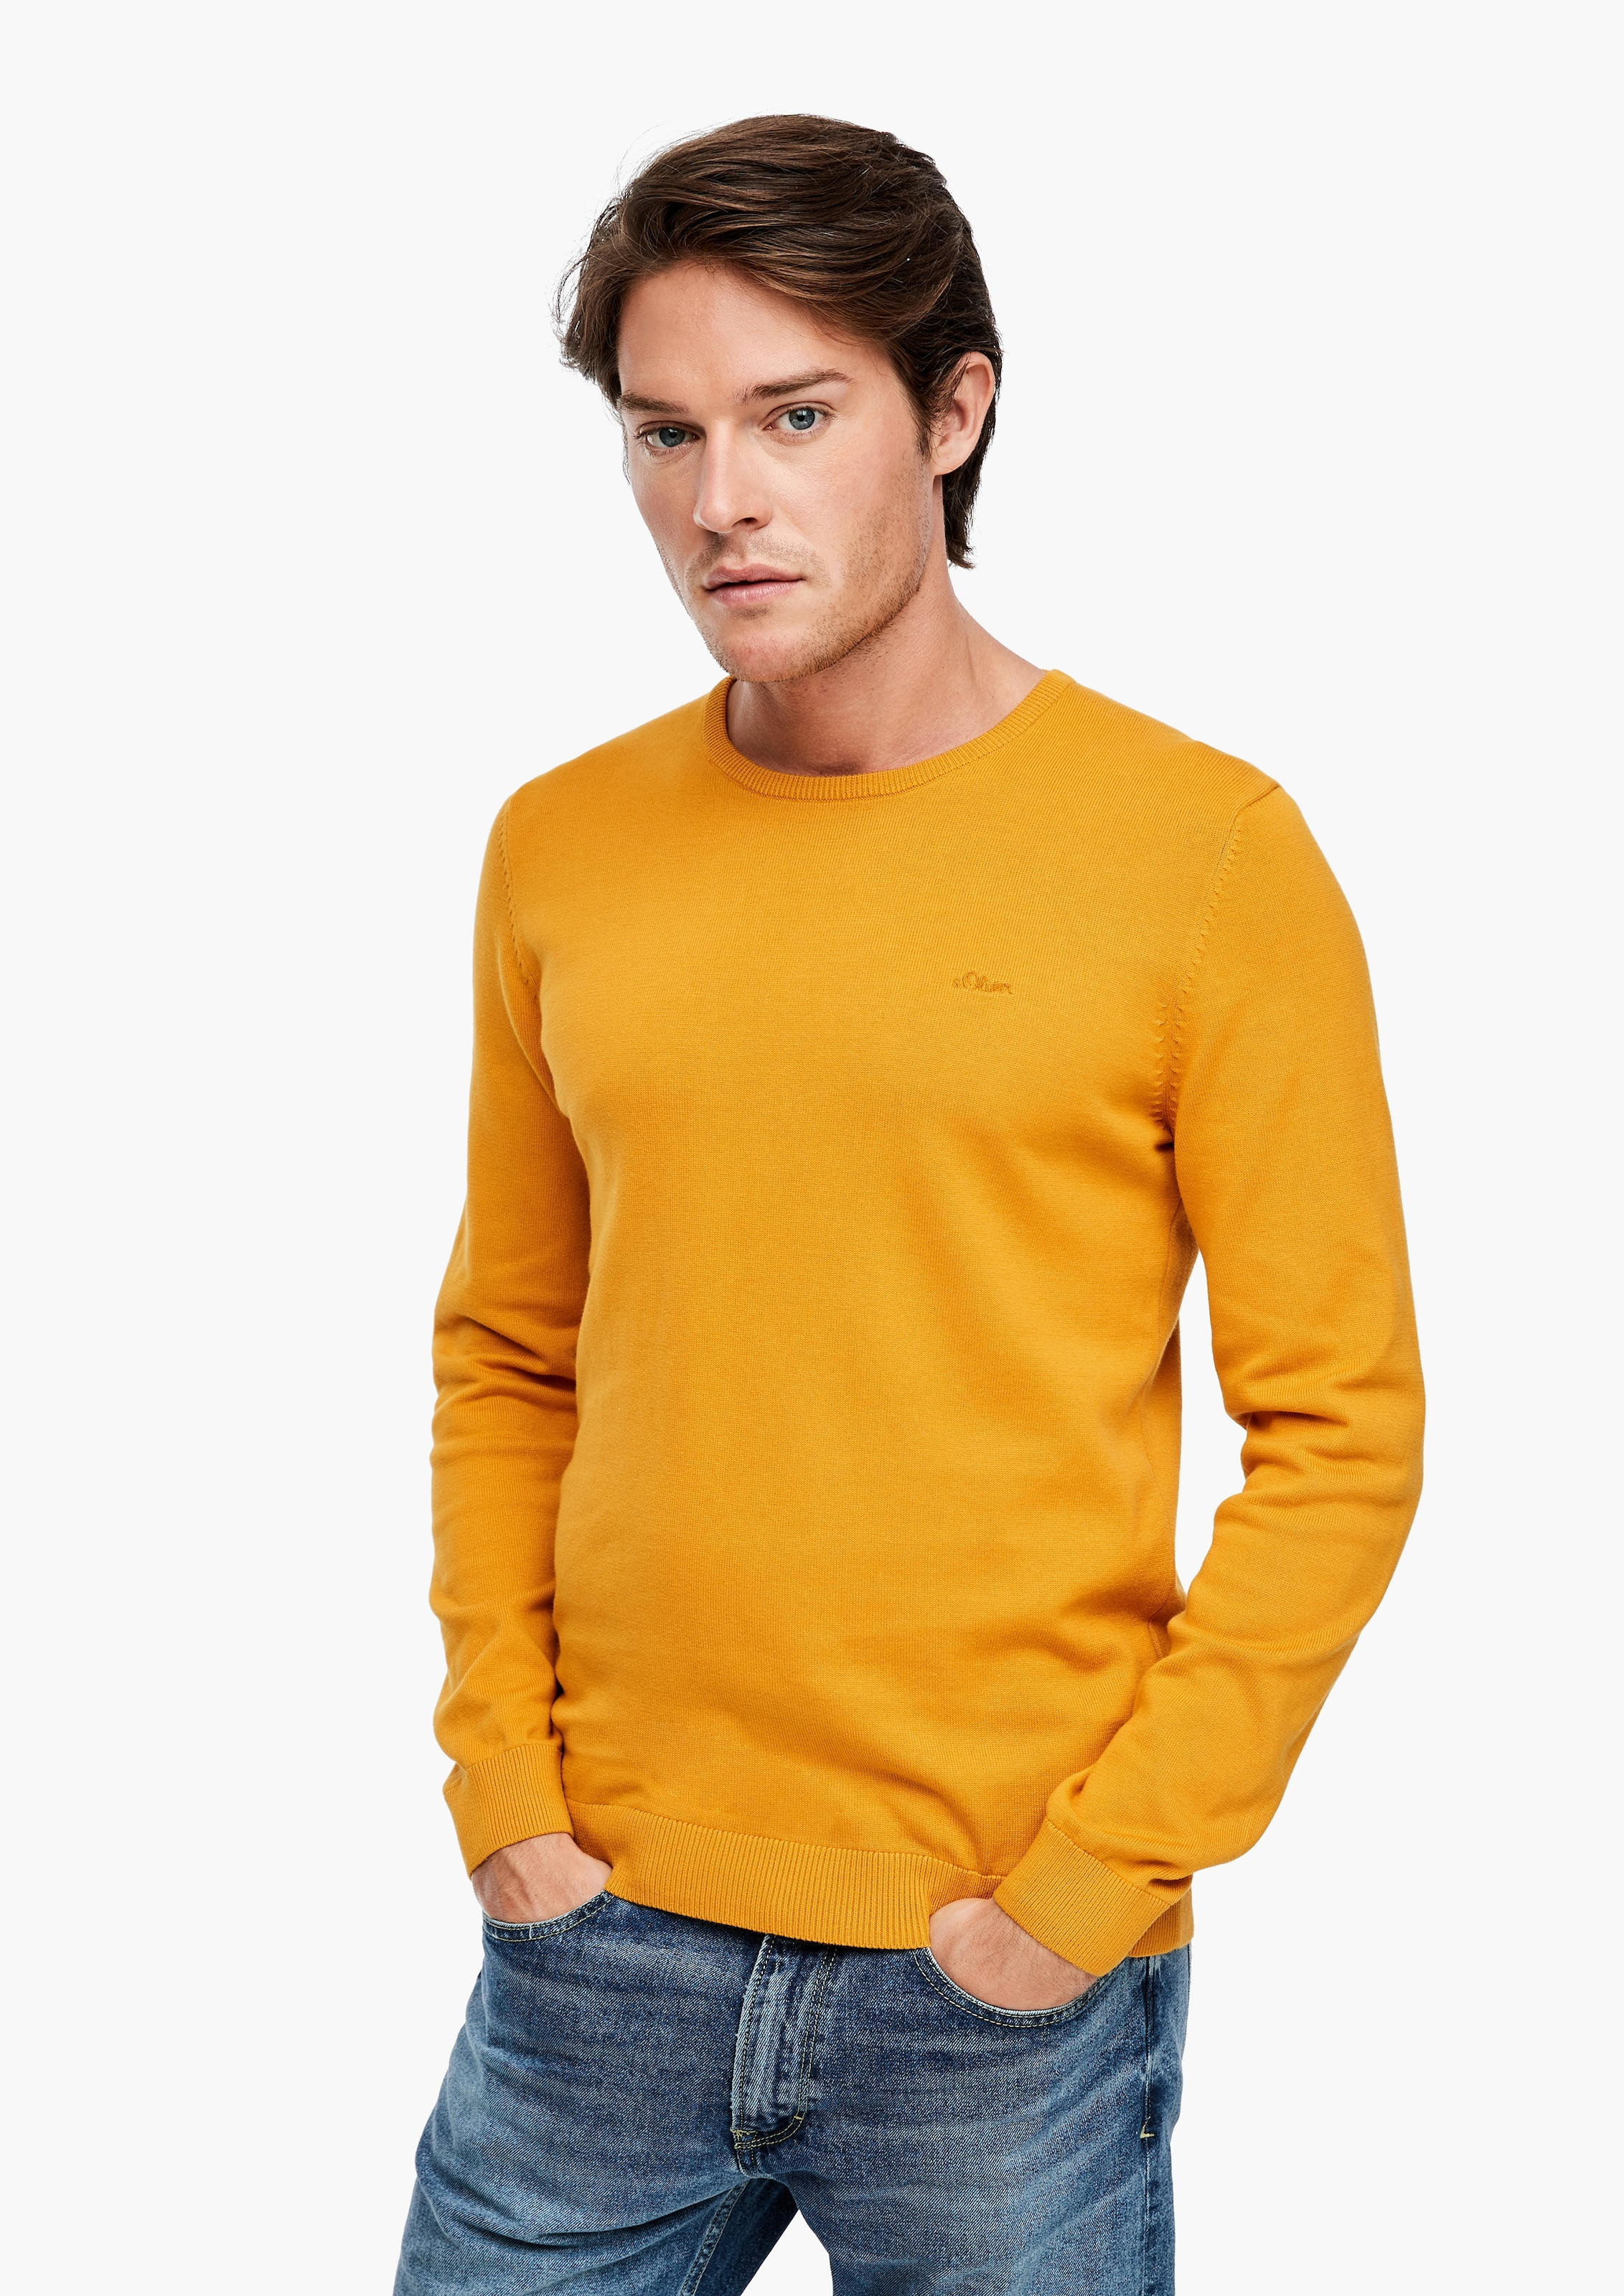 s.Oliver Pullover in gelb Unifarben 03.899.61.7625.1549.3XL